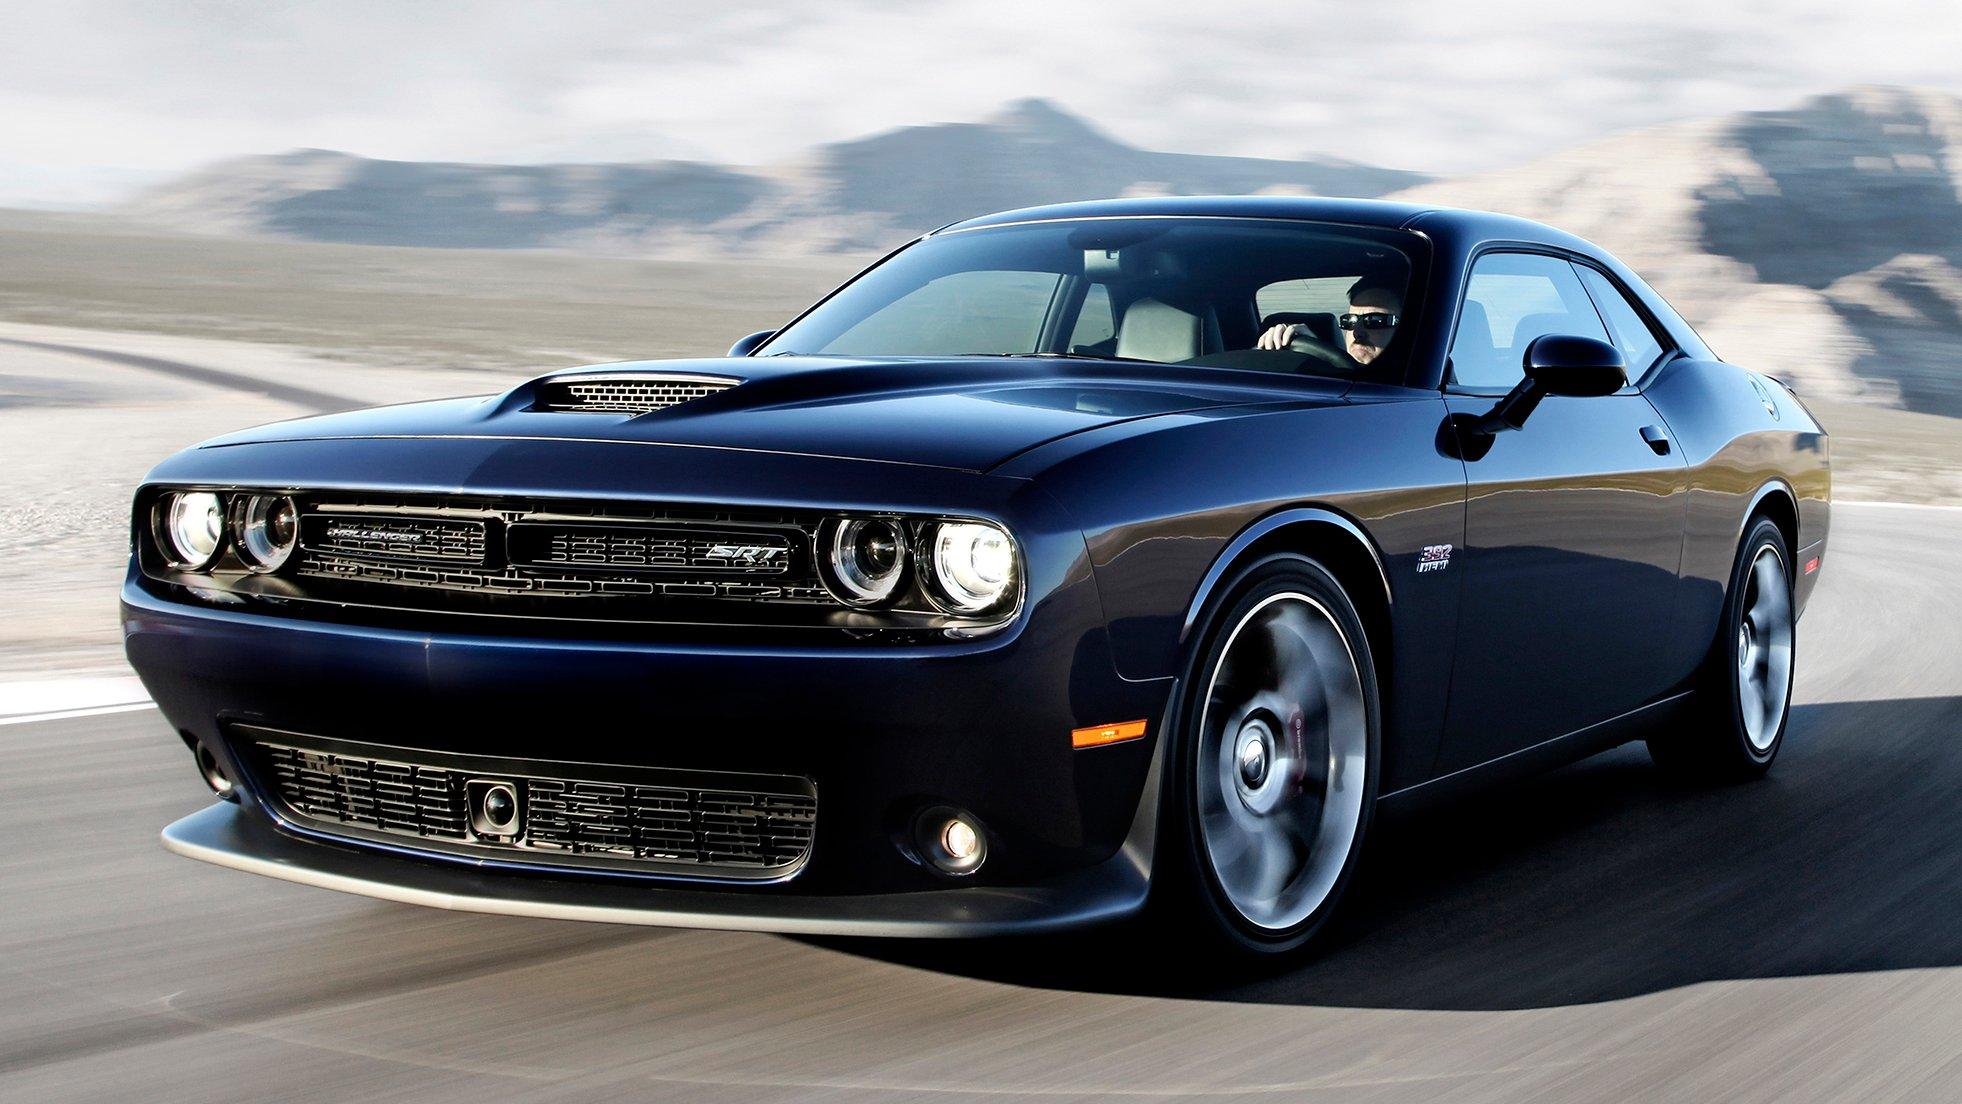 Dodge 2015 >> Dodge Challenger SRT – new 6.2 V8 mill with 707 hp Paul Tan - Image 248573